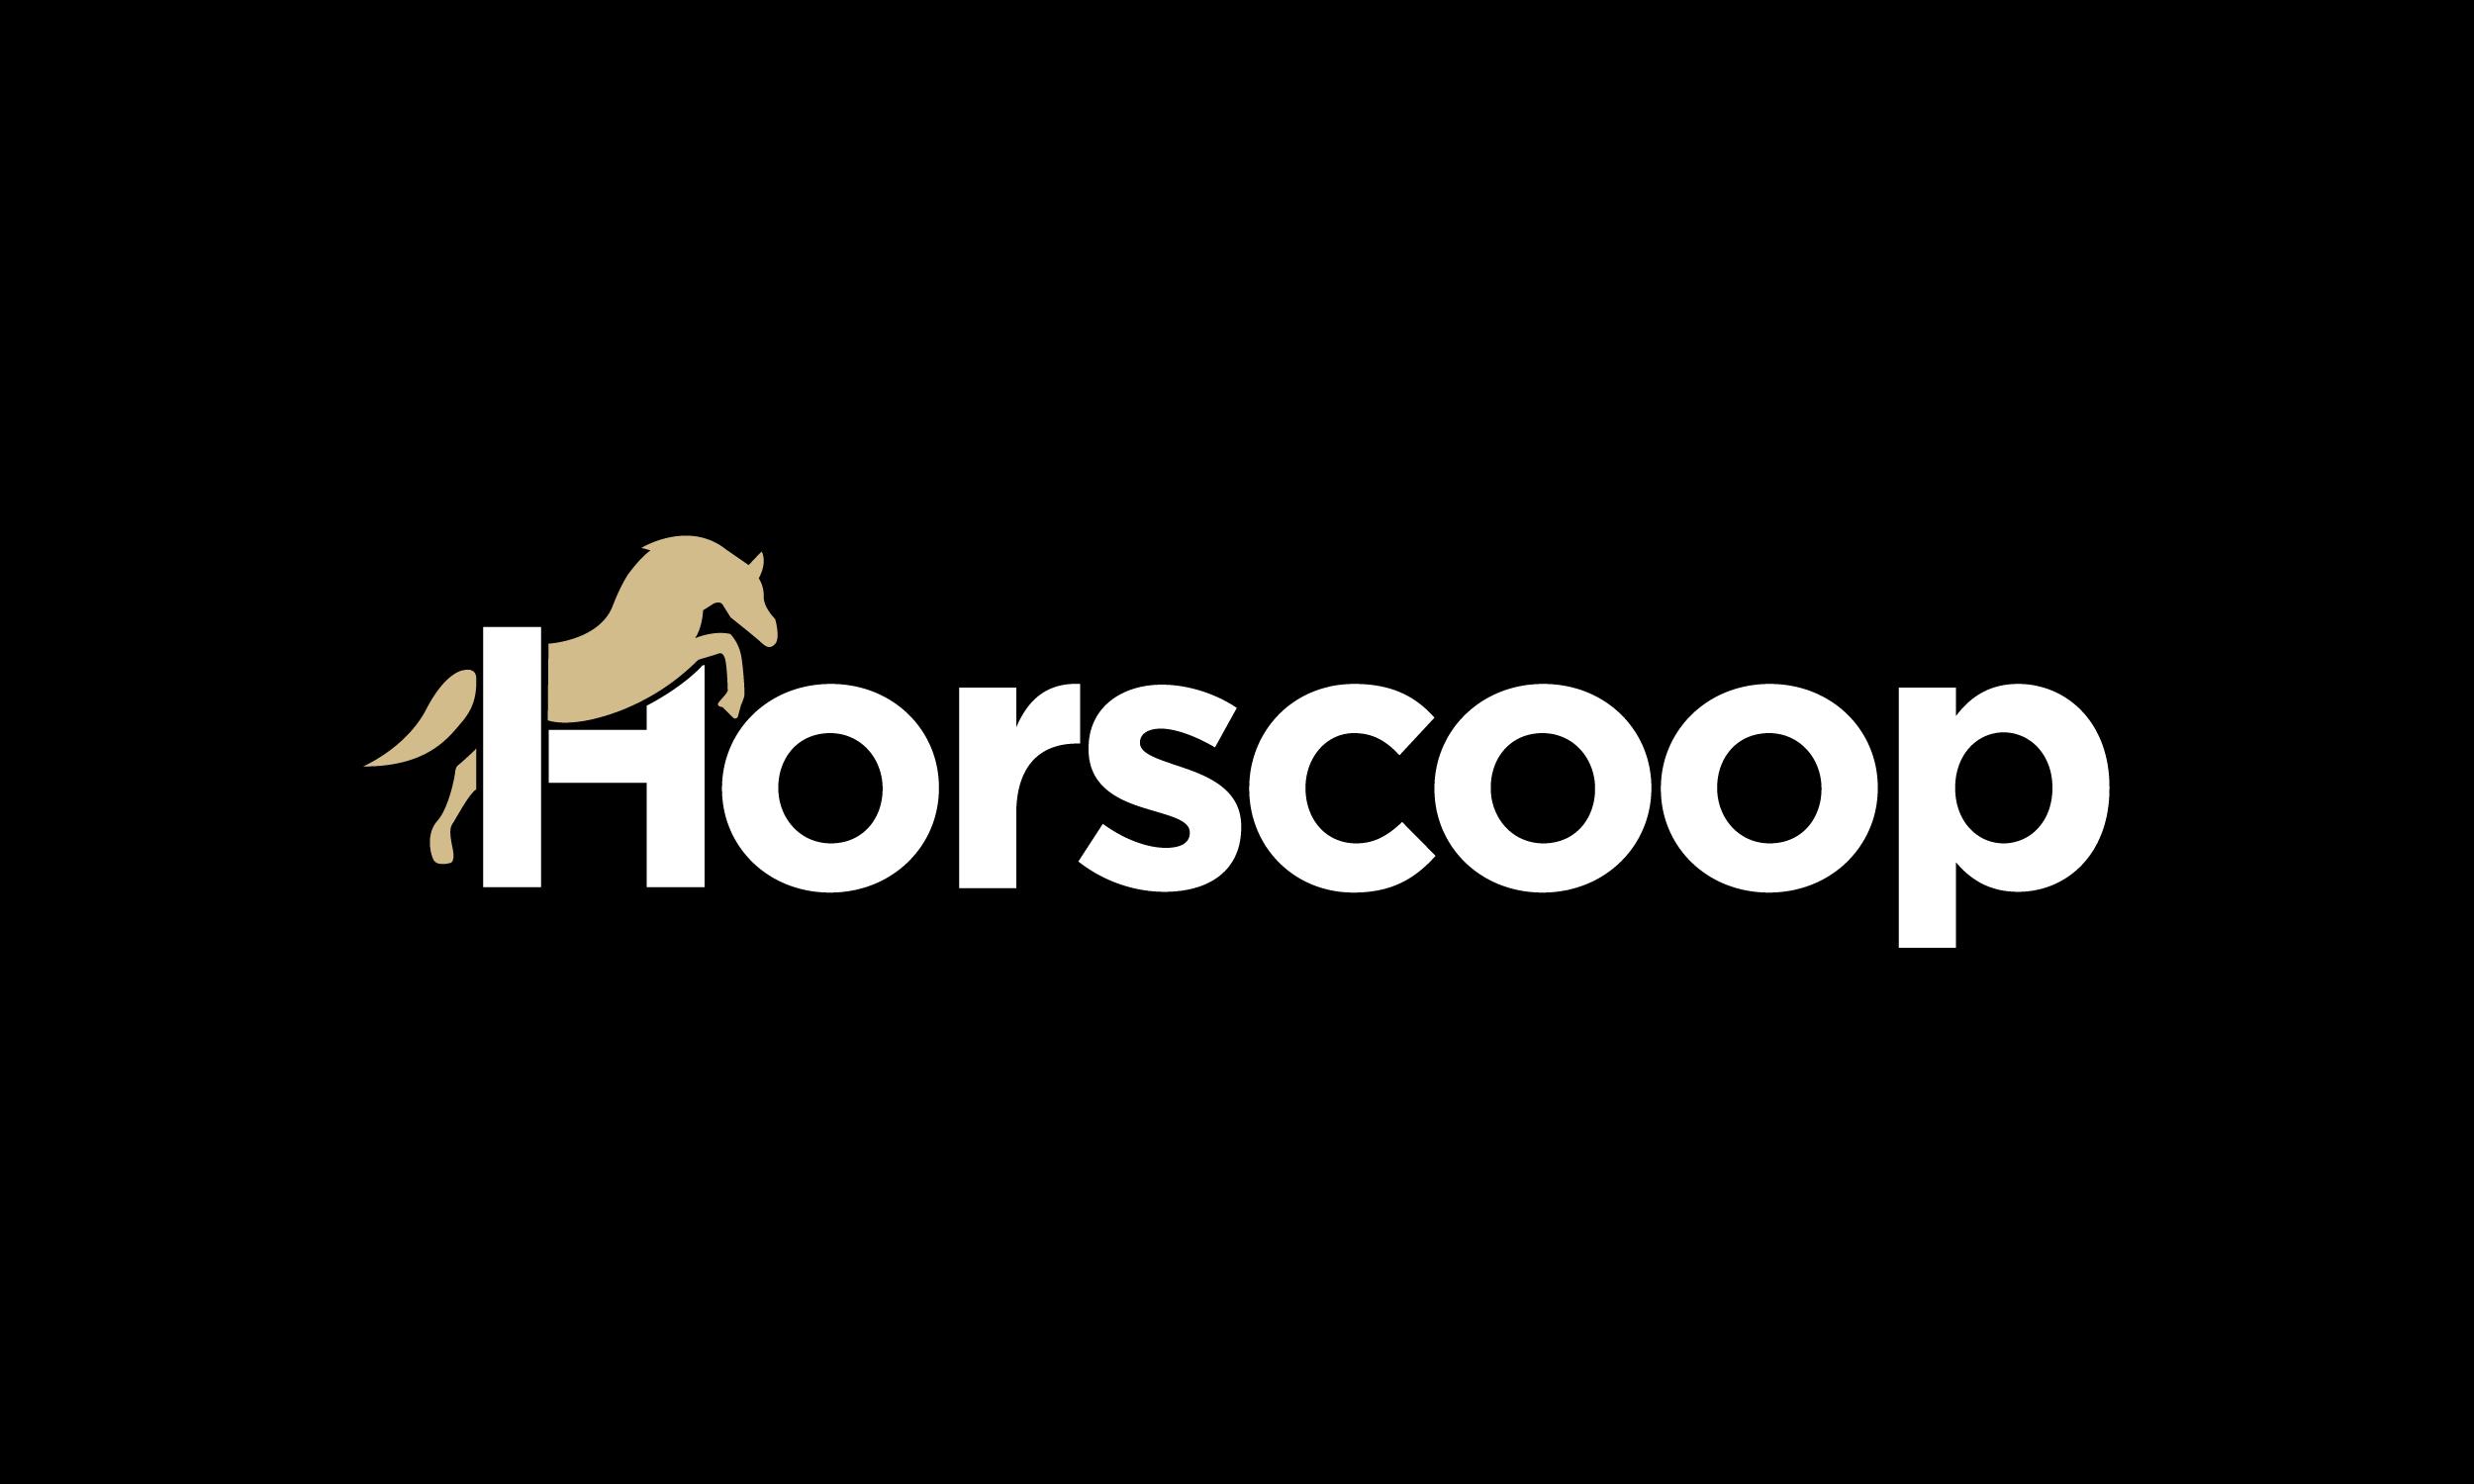 Horscoop-logo-fond-noir